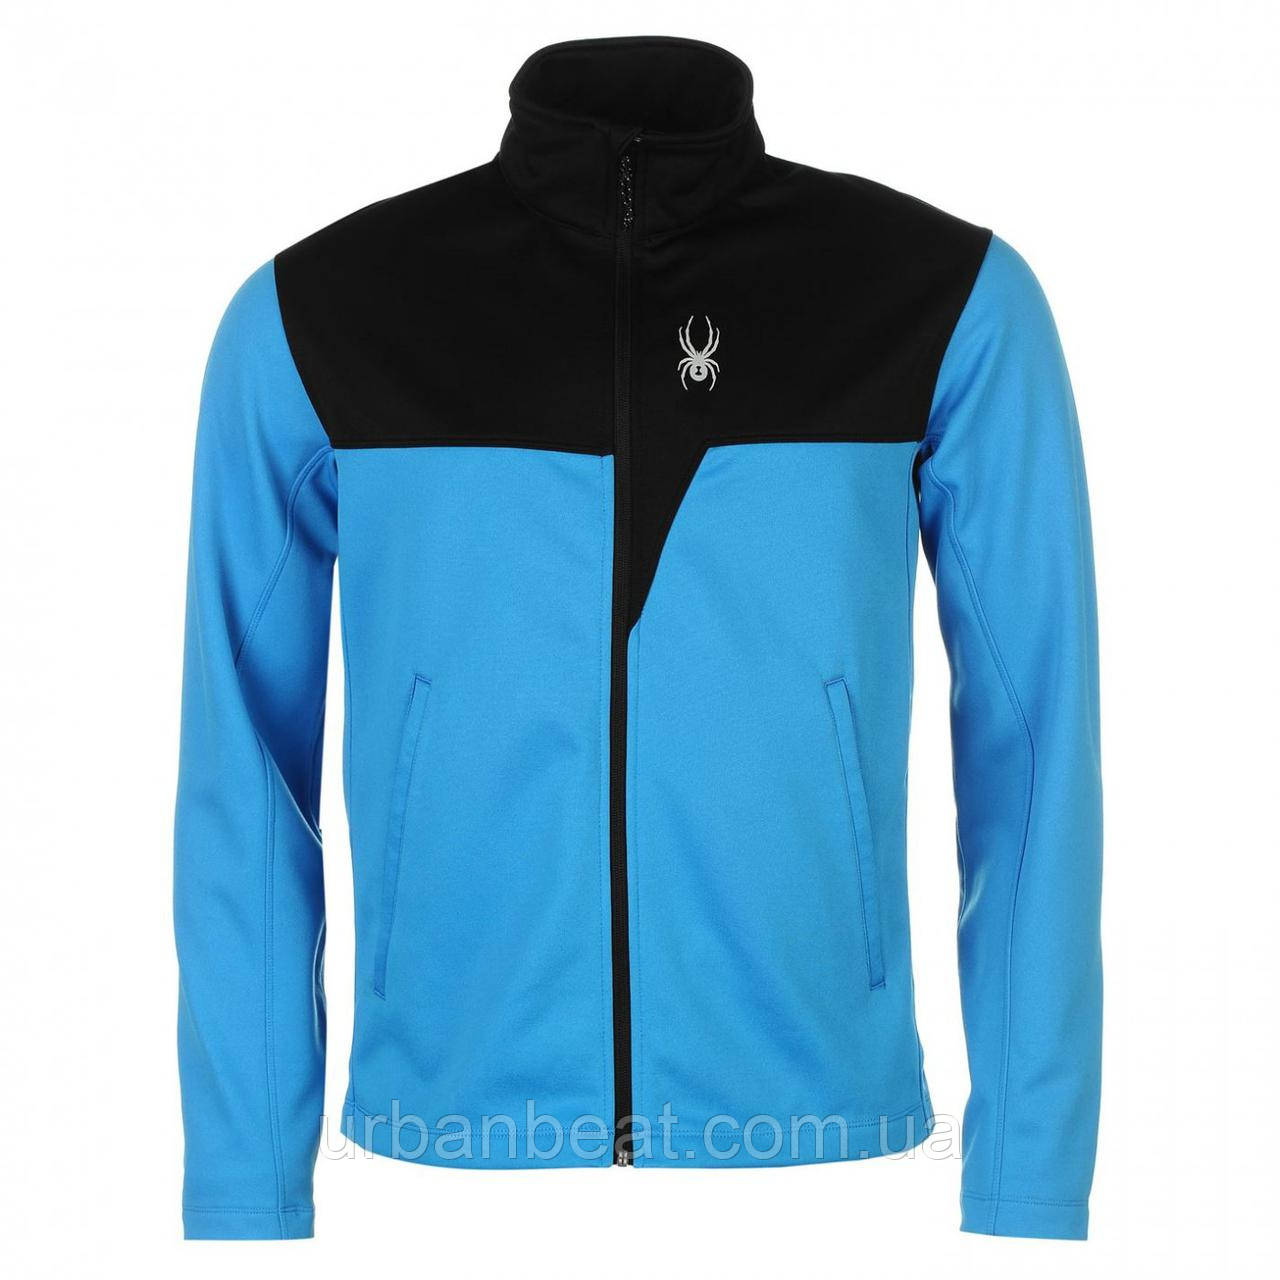 4b1a3068 Мужская кофта Spyder Ryder Full Zip Jacket 6231-2 (ОРИГИНАЛ) - Urban Beat